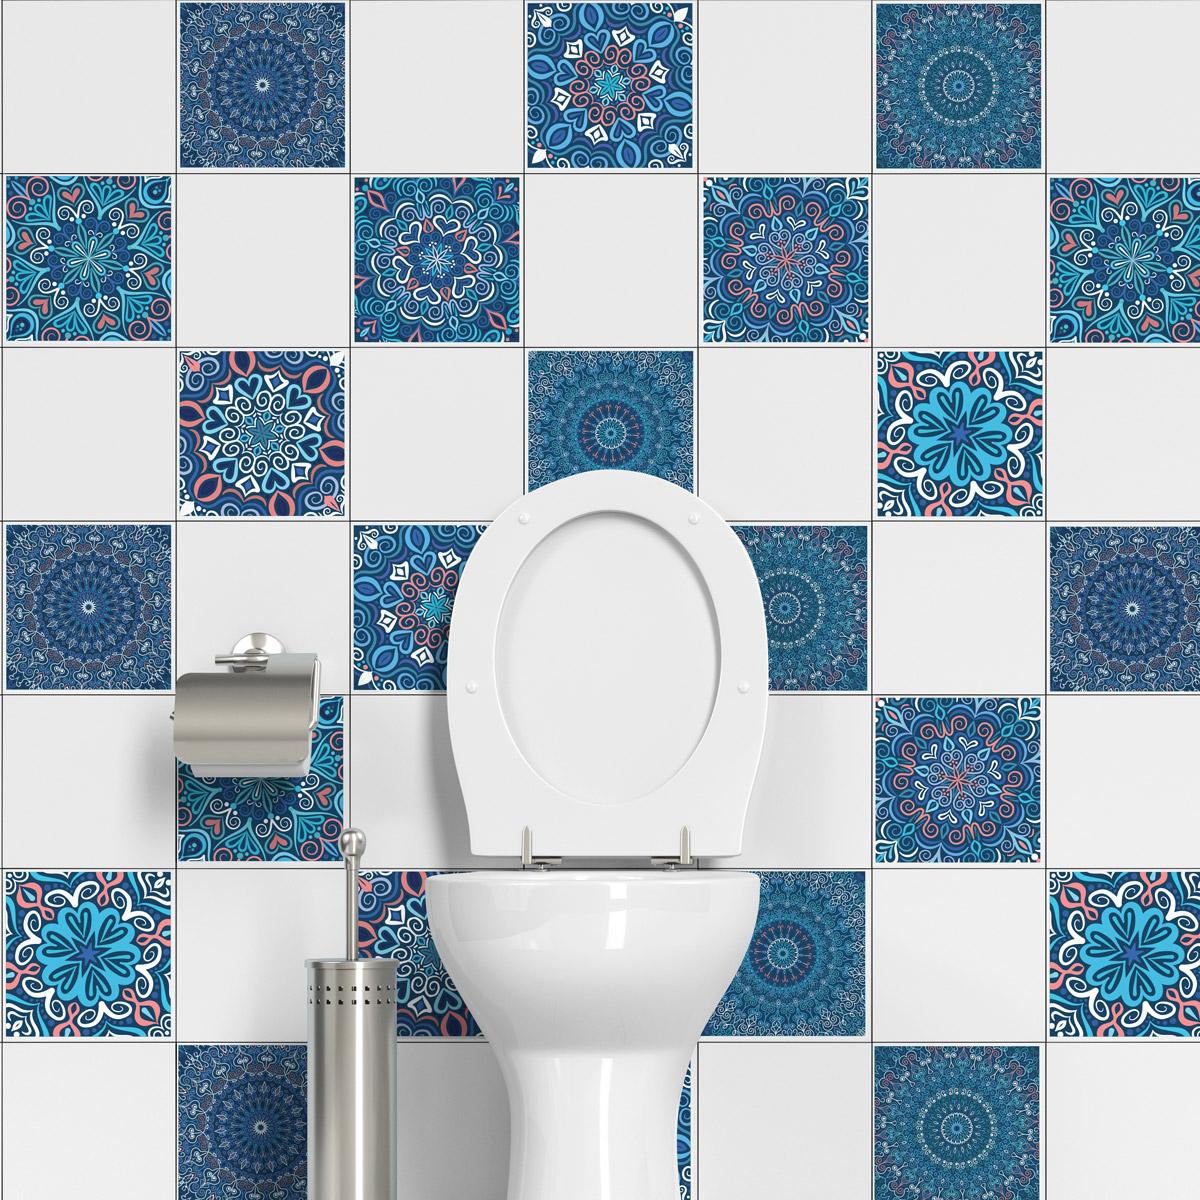 24 stickers carrelages azulejos ornements m diterran en. Black Bedroom Furniture Sets. Home Design Ideas